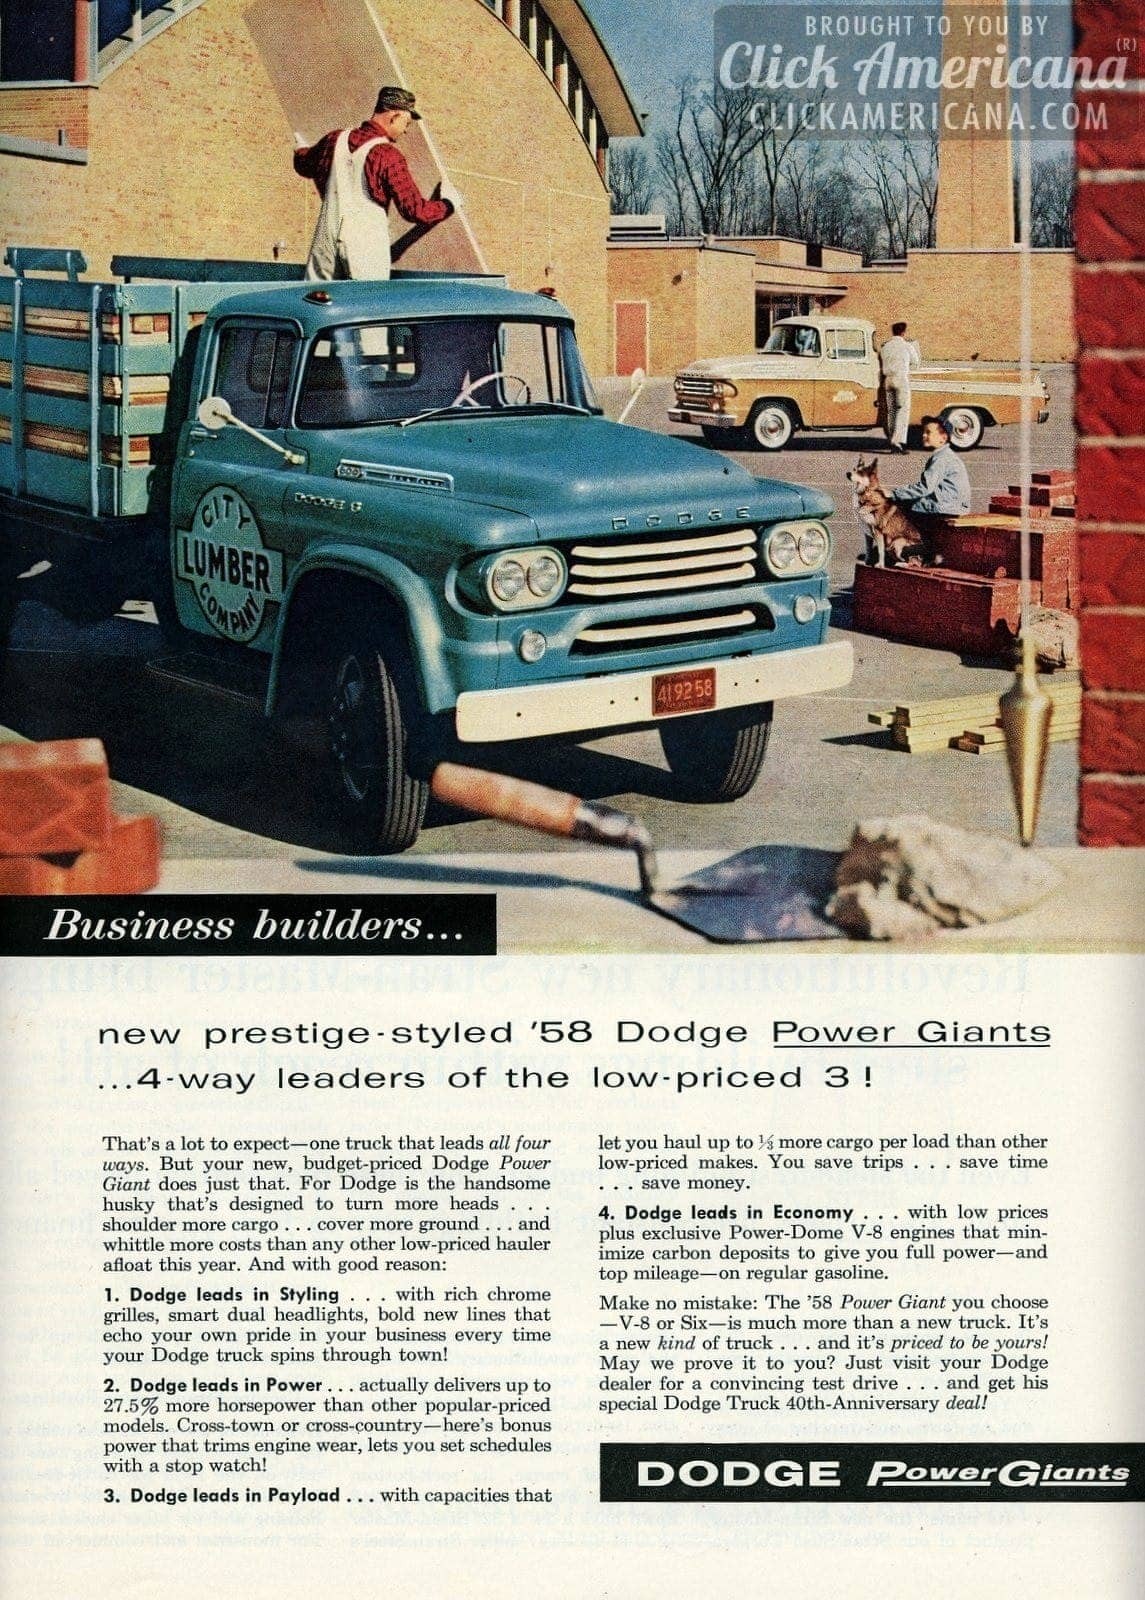 New Prestige Styled 58 Dodge Power Giants Click Americana 1961 Pickup Truck